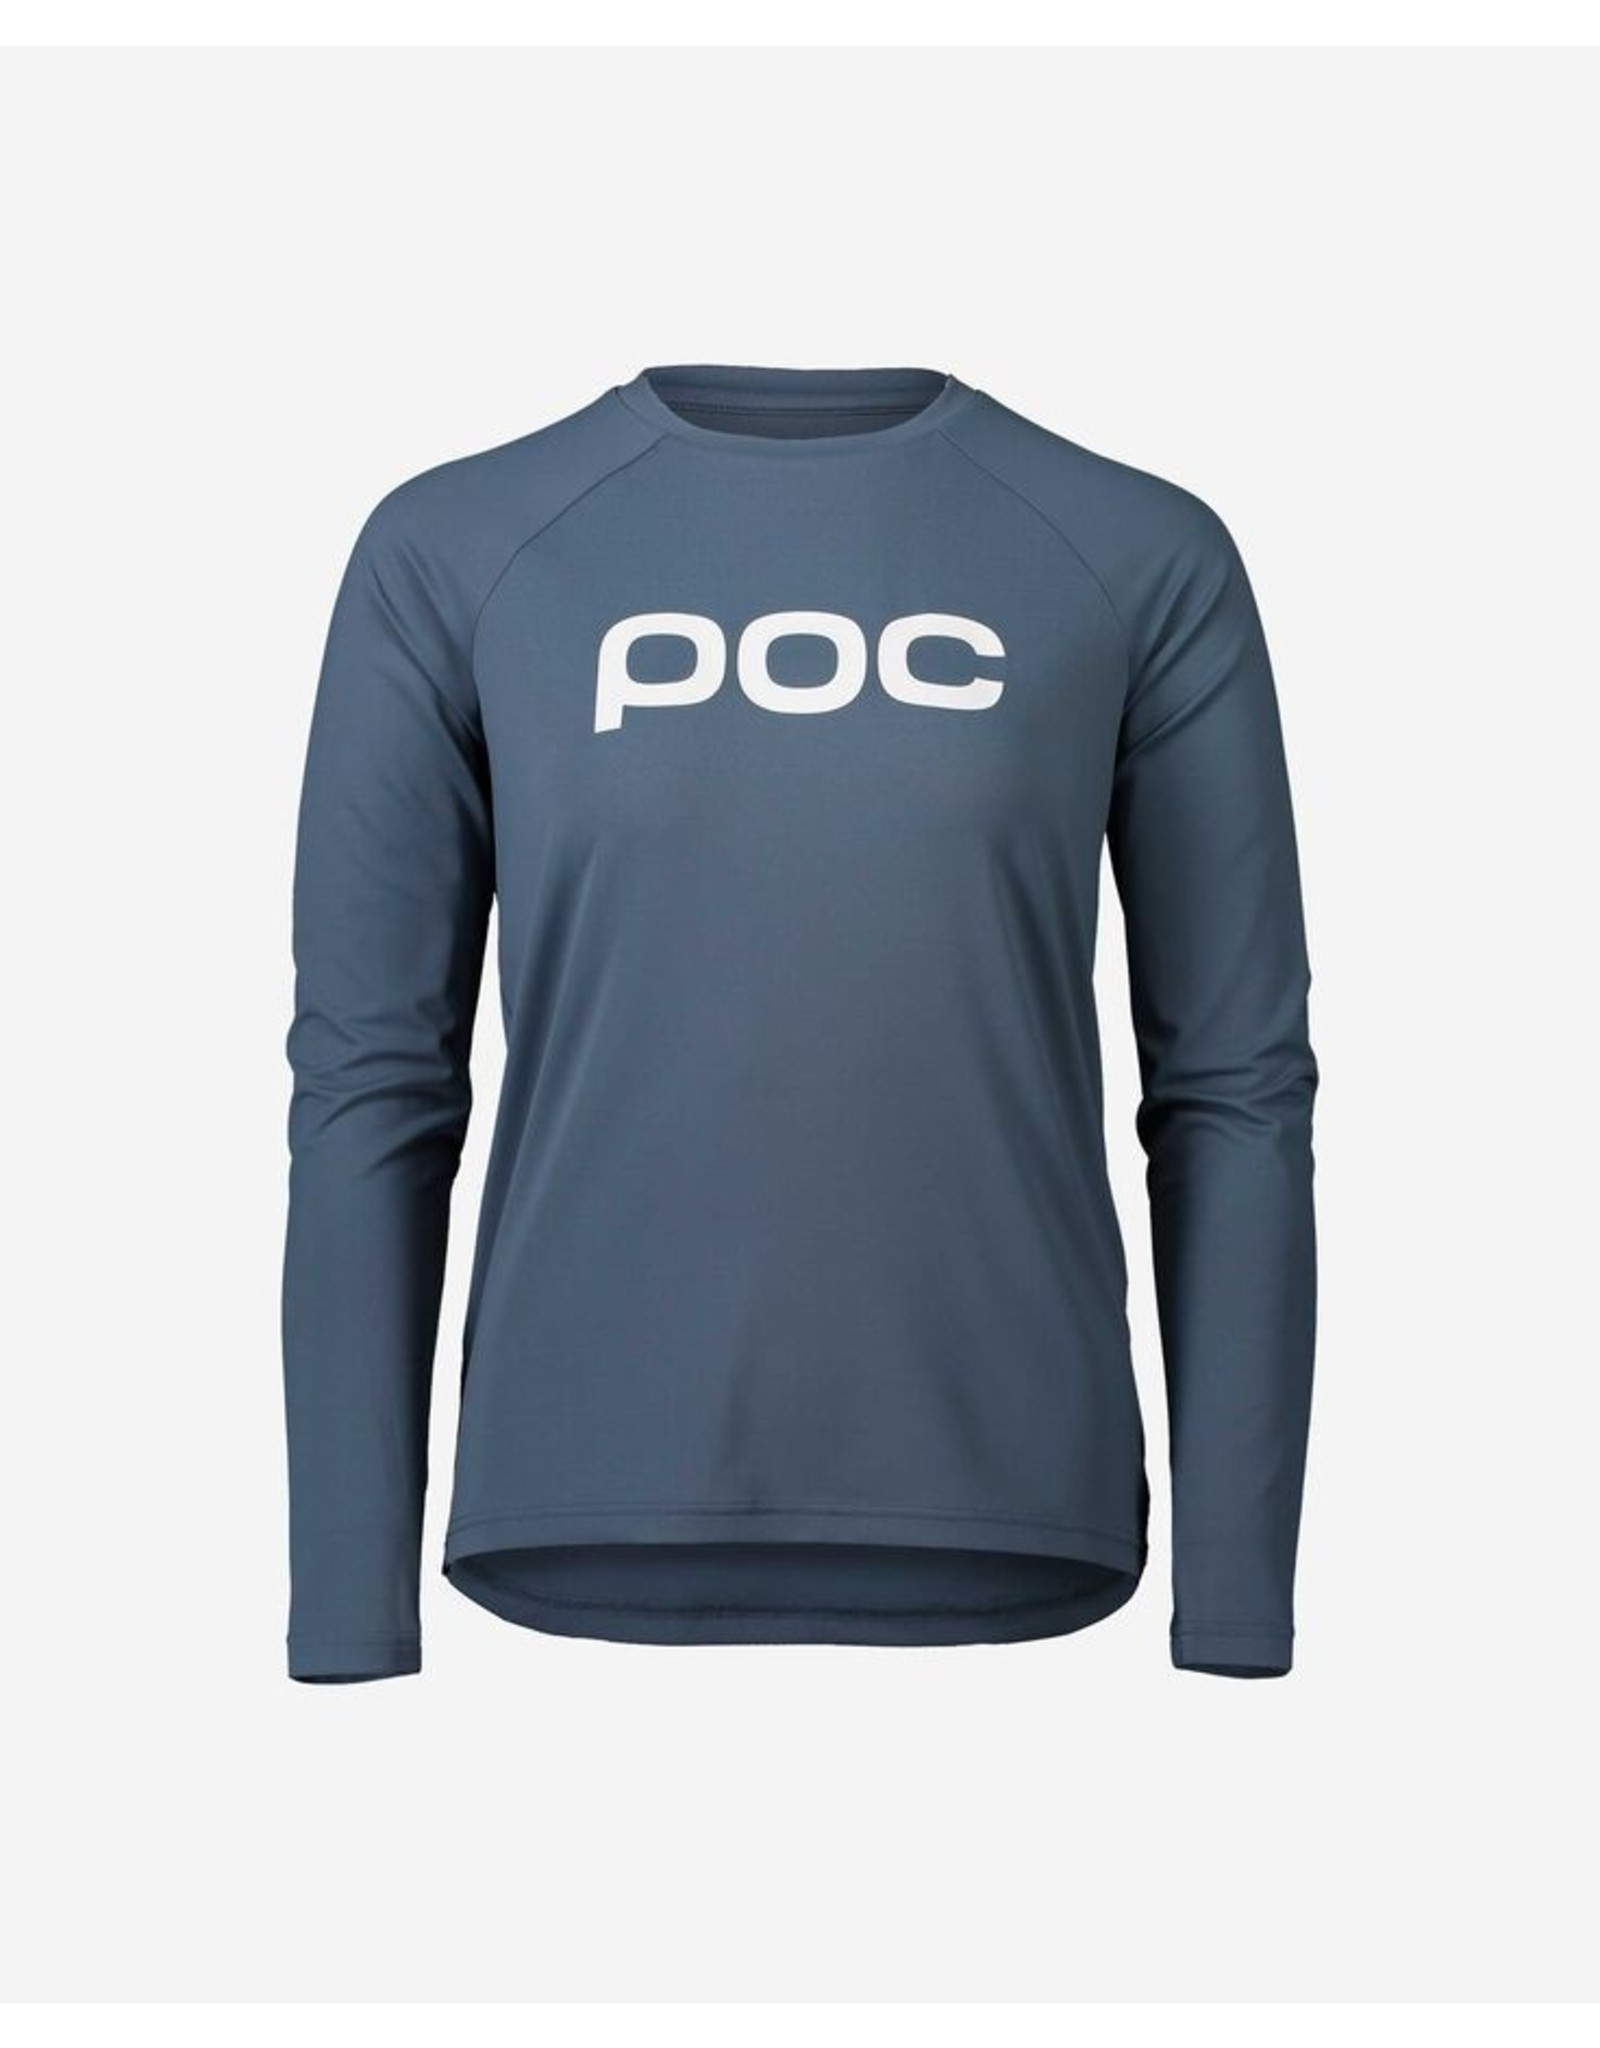 POC POC Essential MTB Women's Jersey